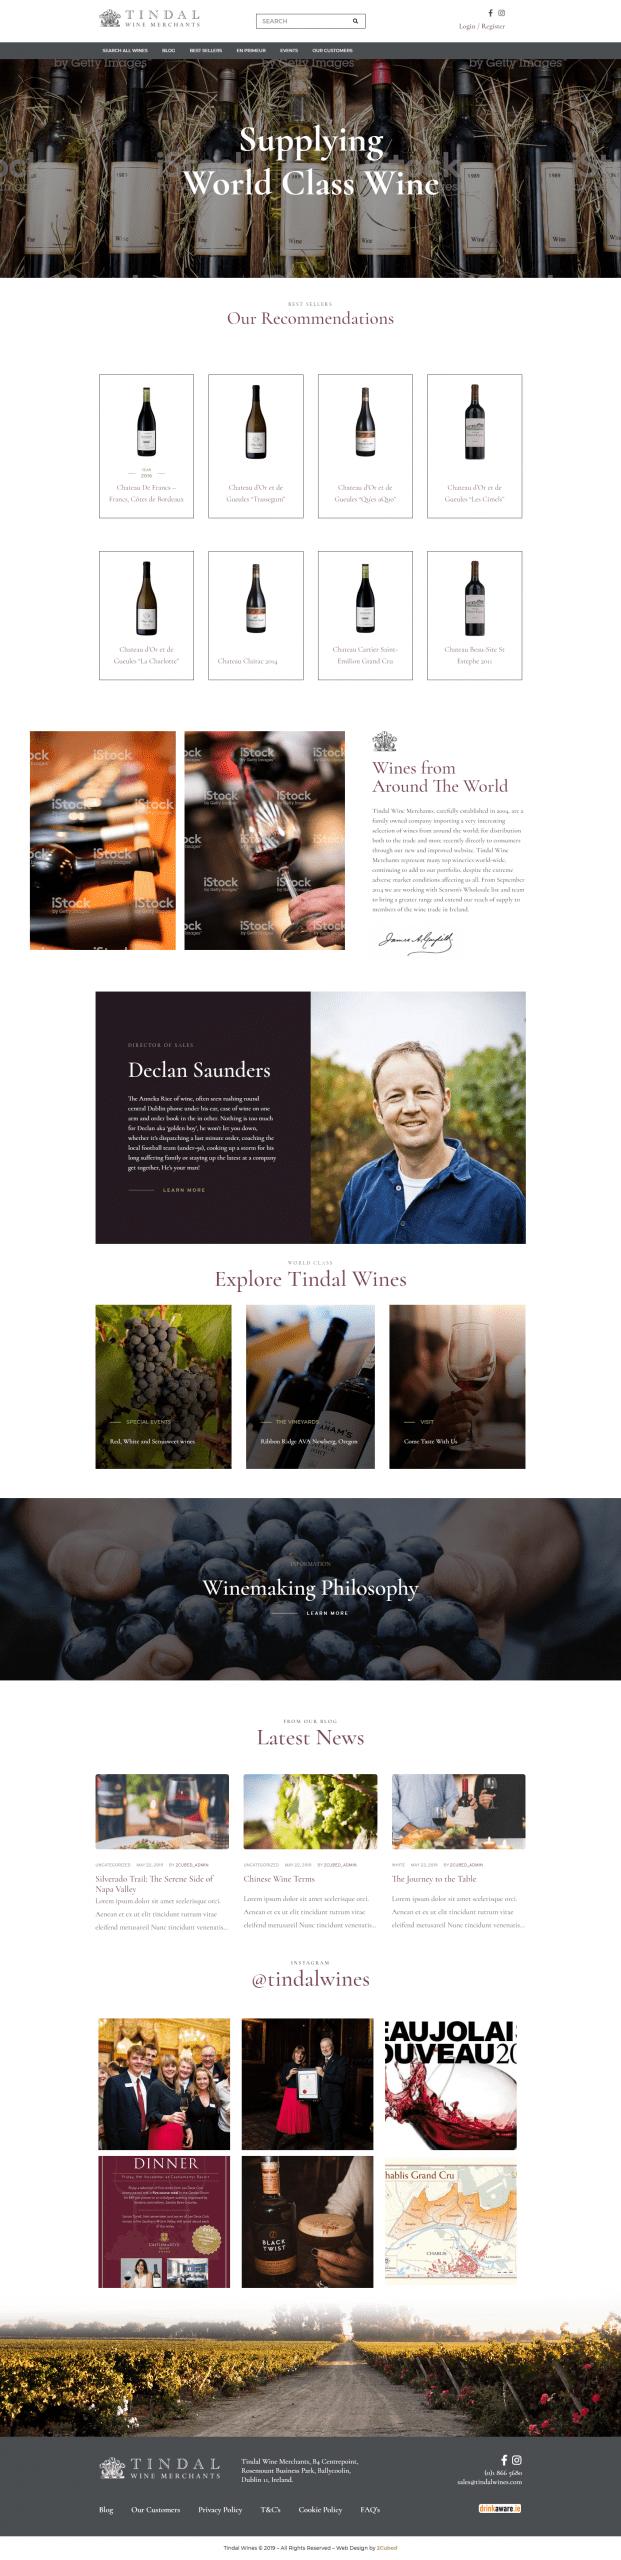 Tindal Wines